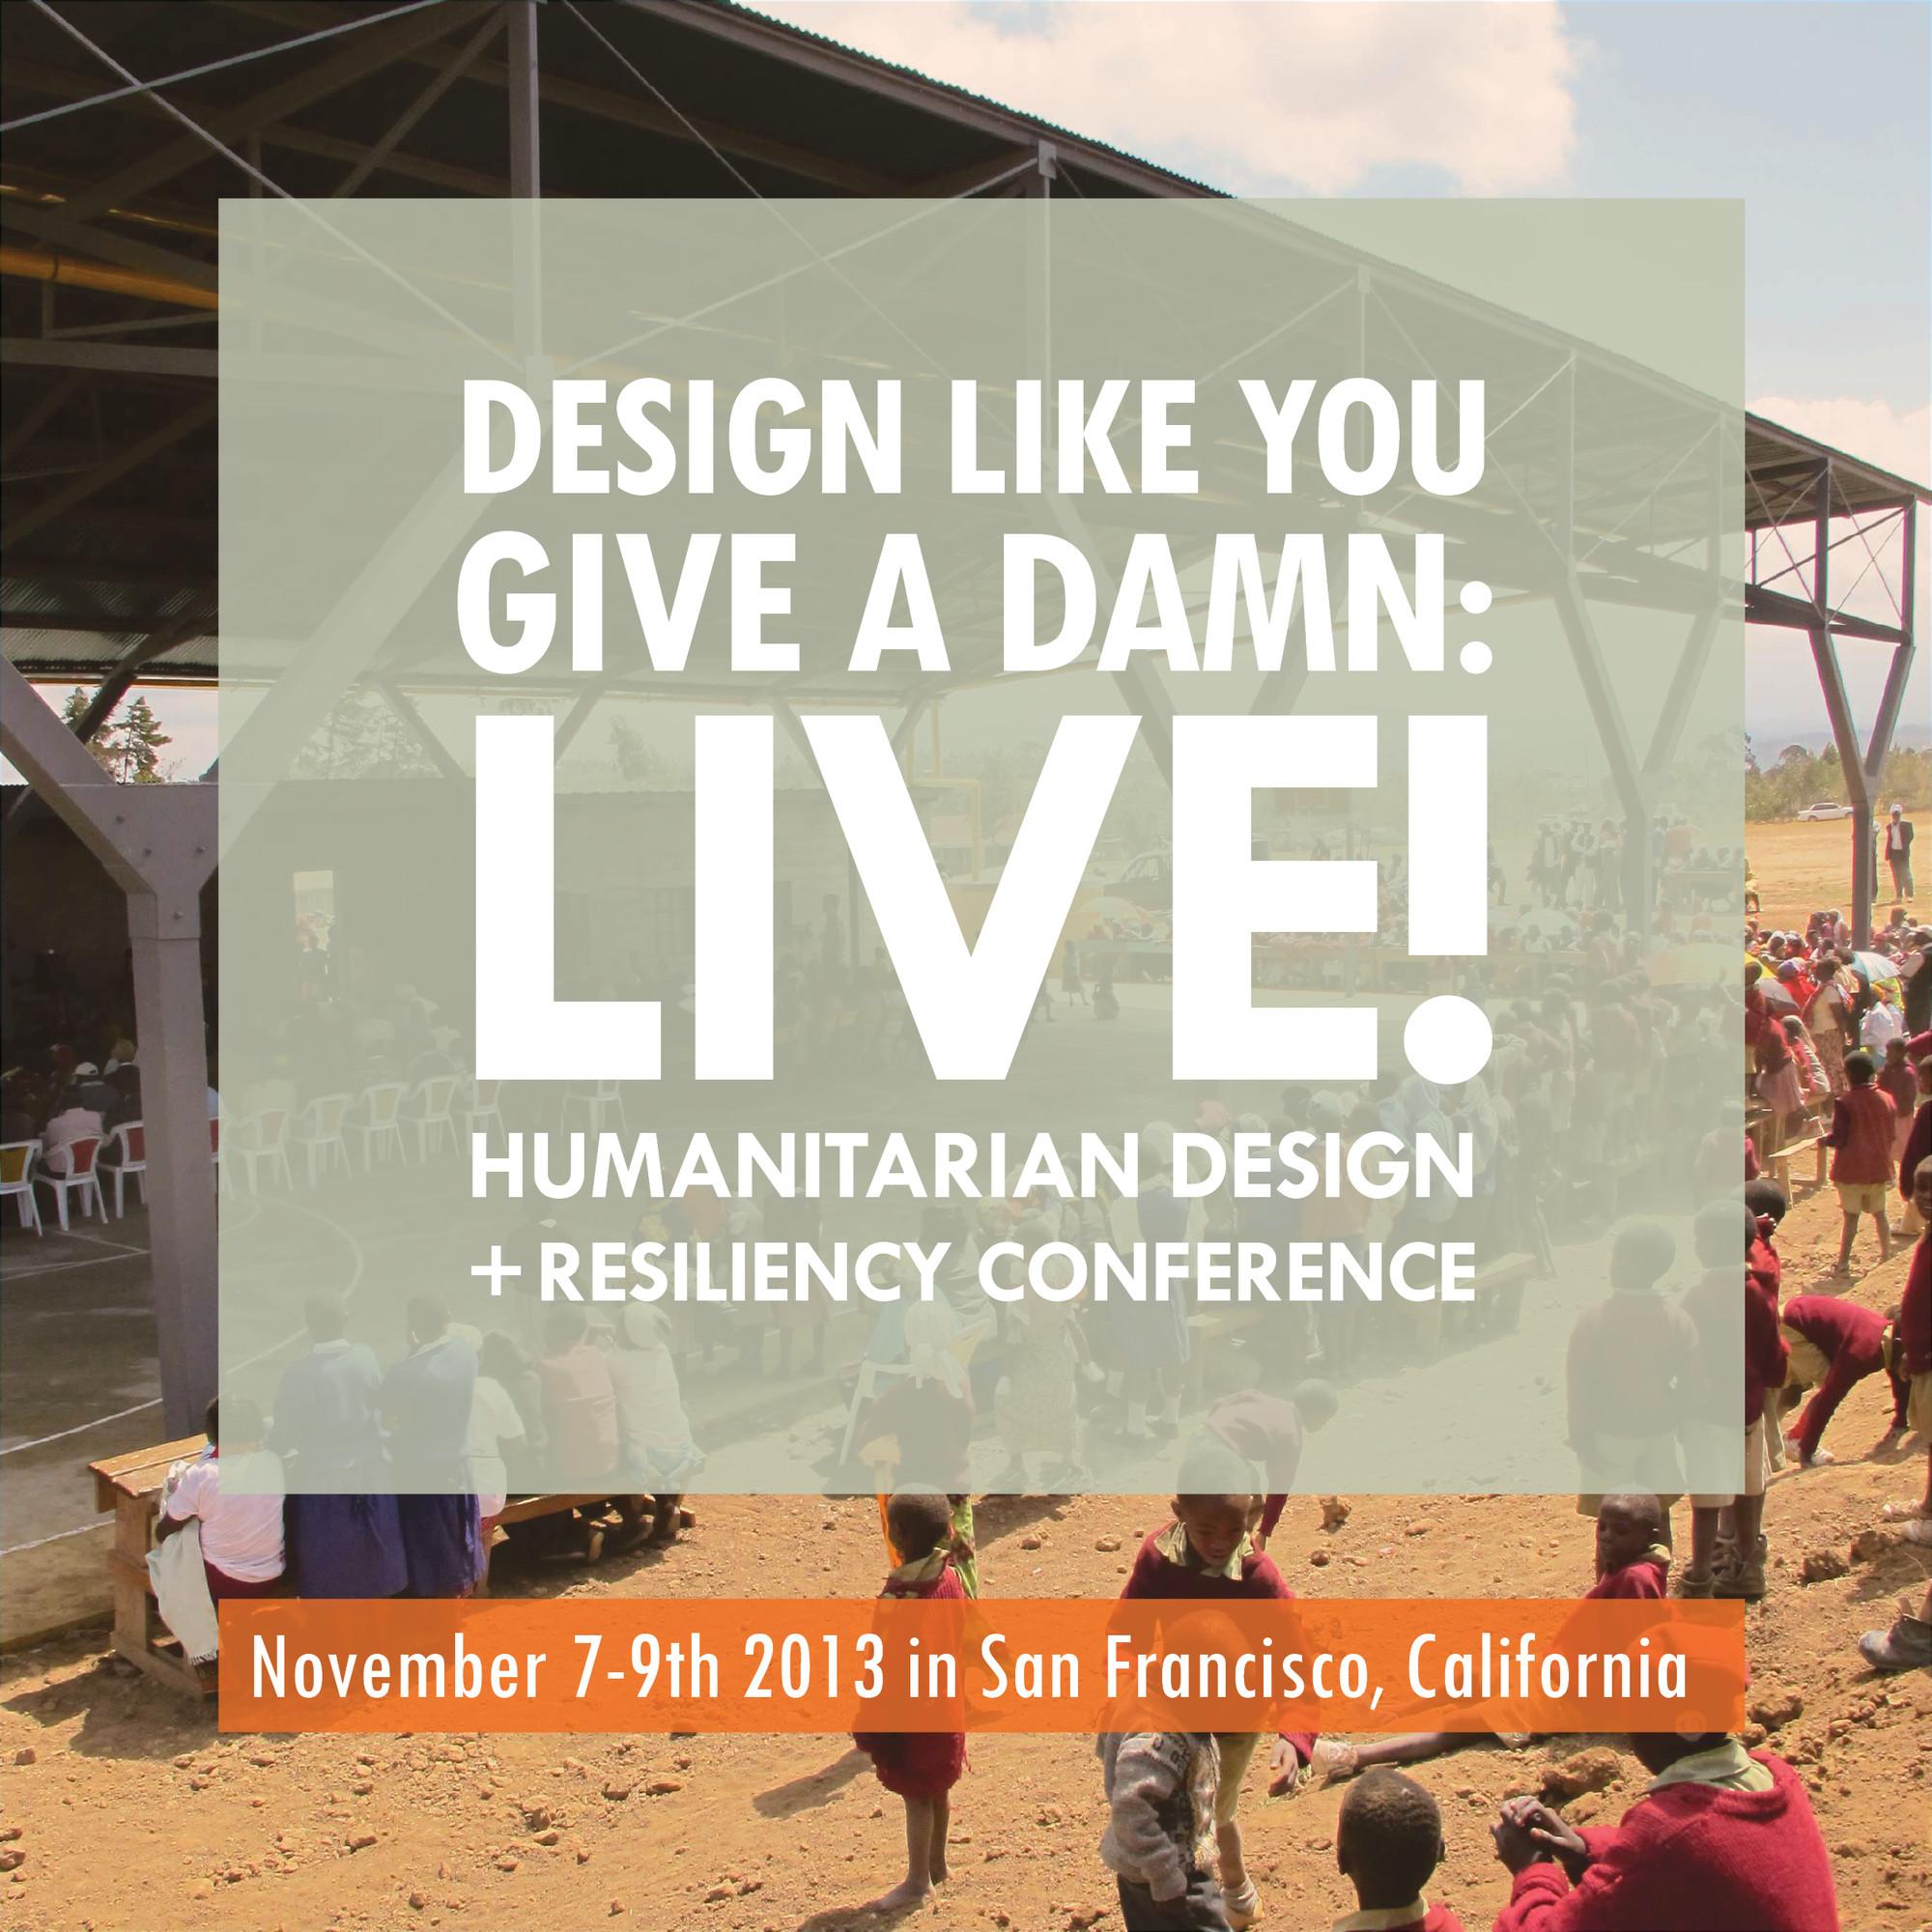 Design Like You Give a Damn: LIVE!